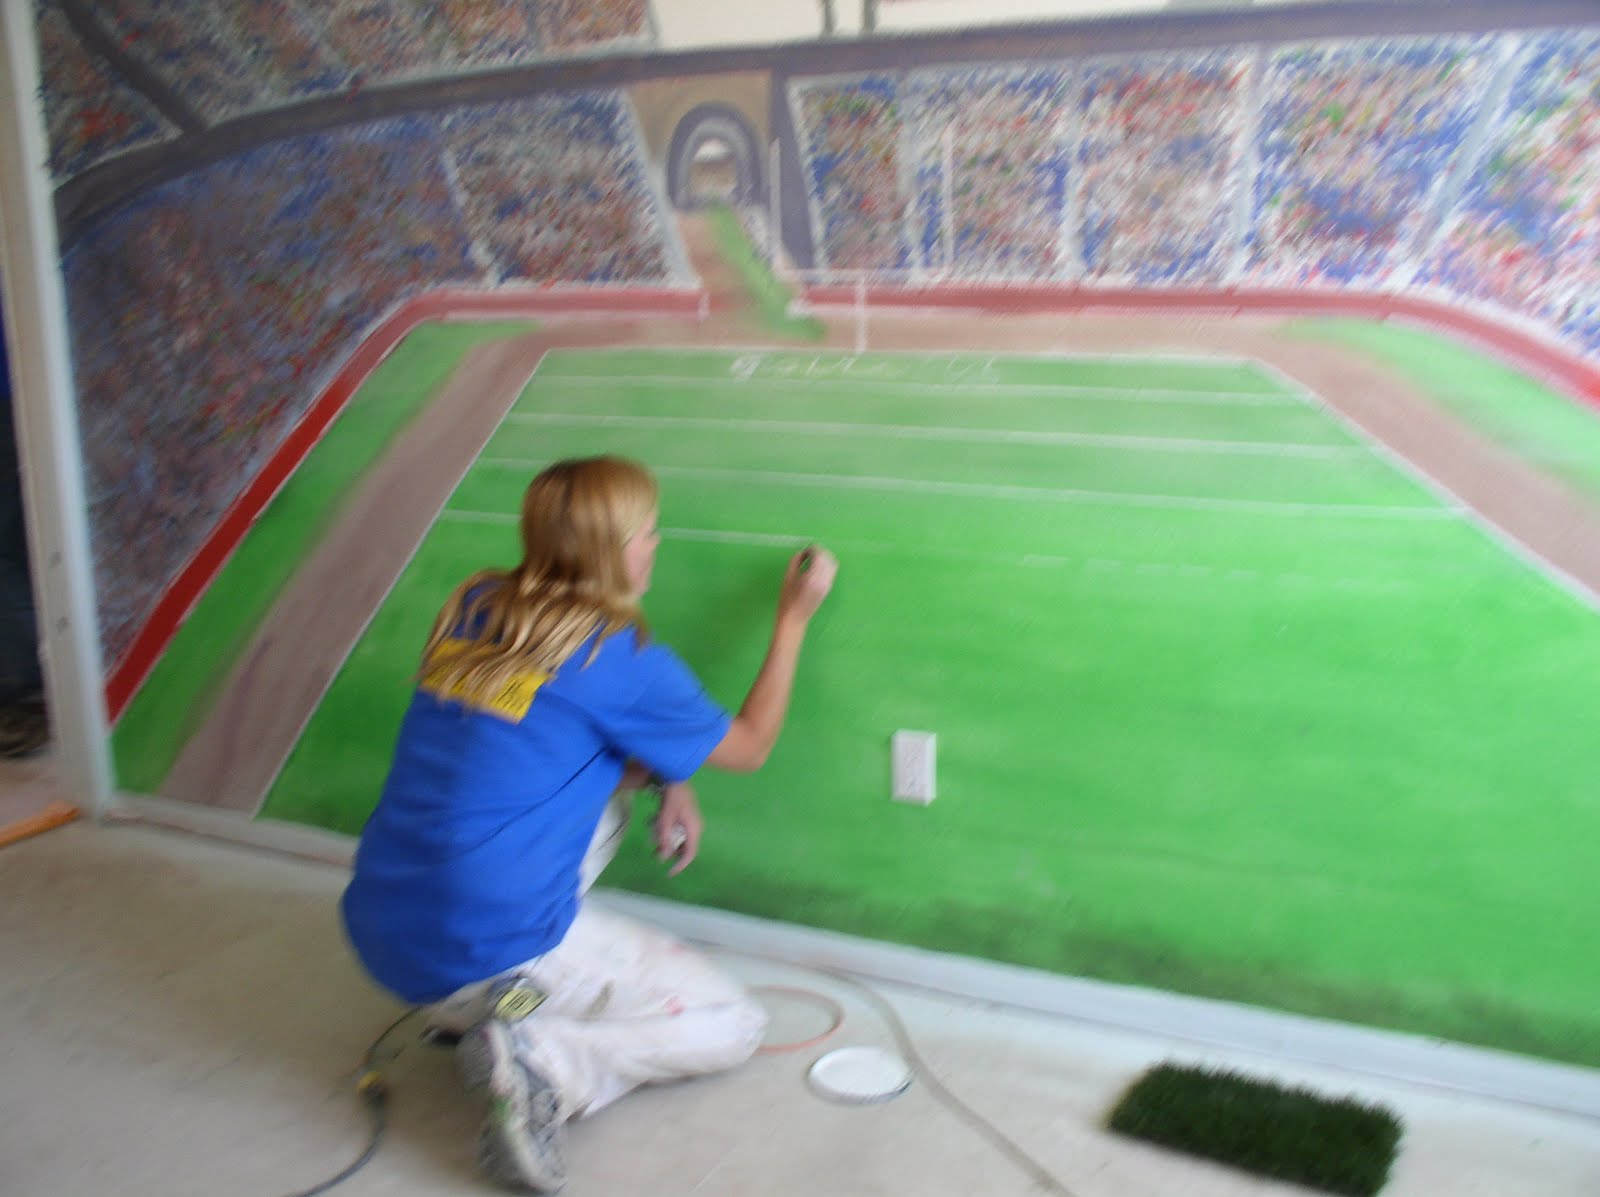 The imbriani house de extreme makeover reconstrucci n for Decoracion de cuartos de ninos de futbol